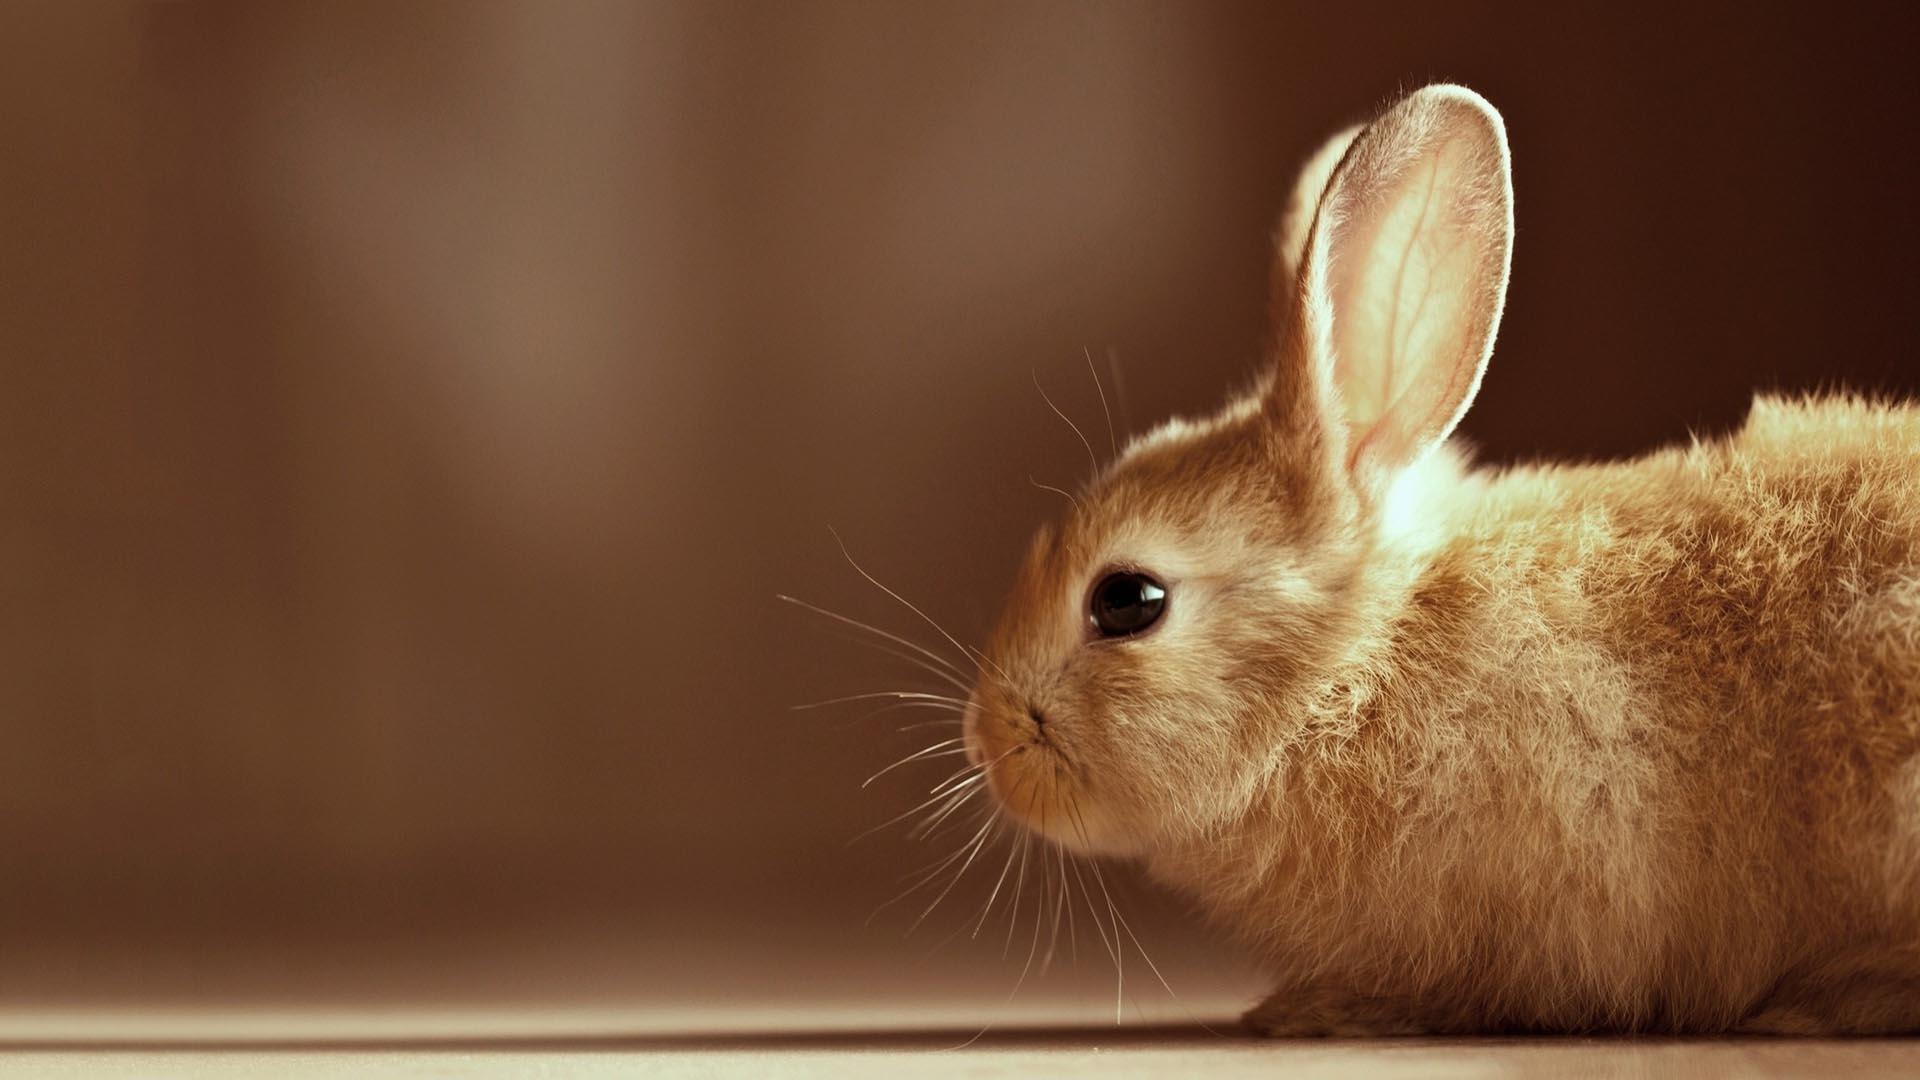 Cute Bunny Desktop Wallpapers   Top Cute Bunny Desktop 1920x1080